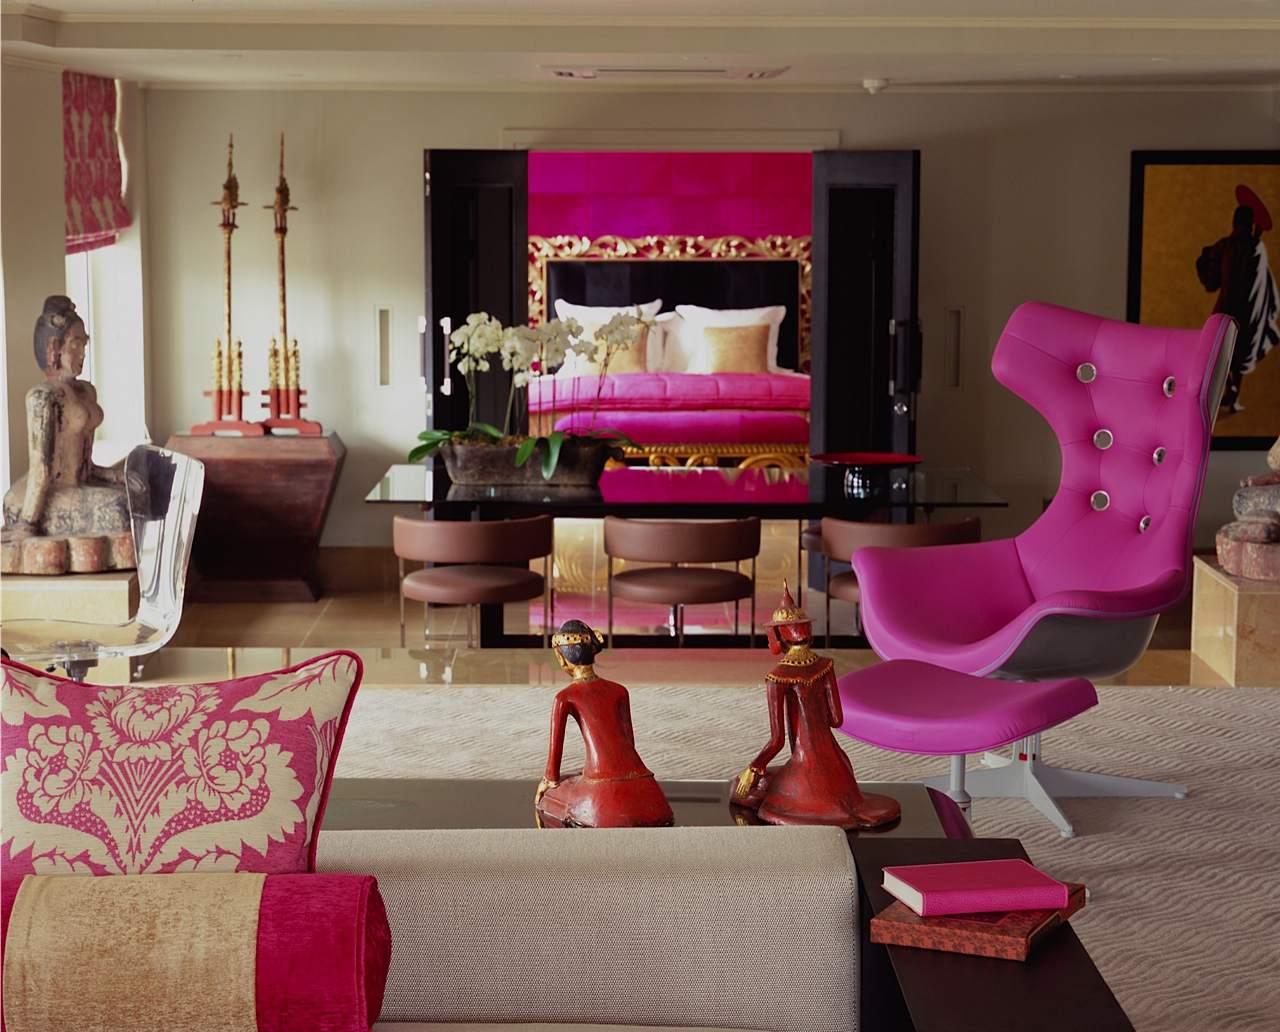 Schiaparelli Suite in the May Fair Hotel London